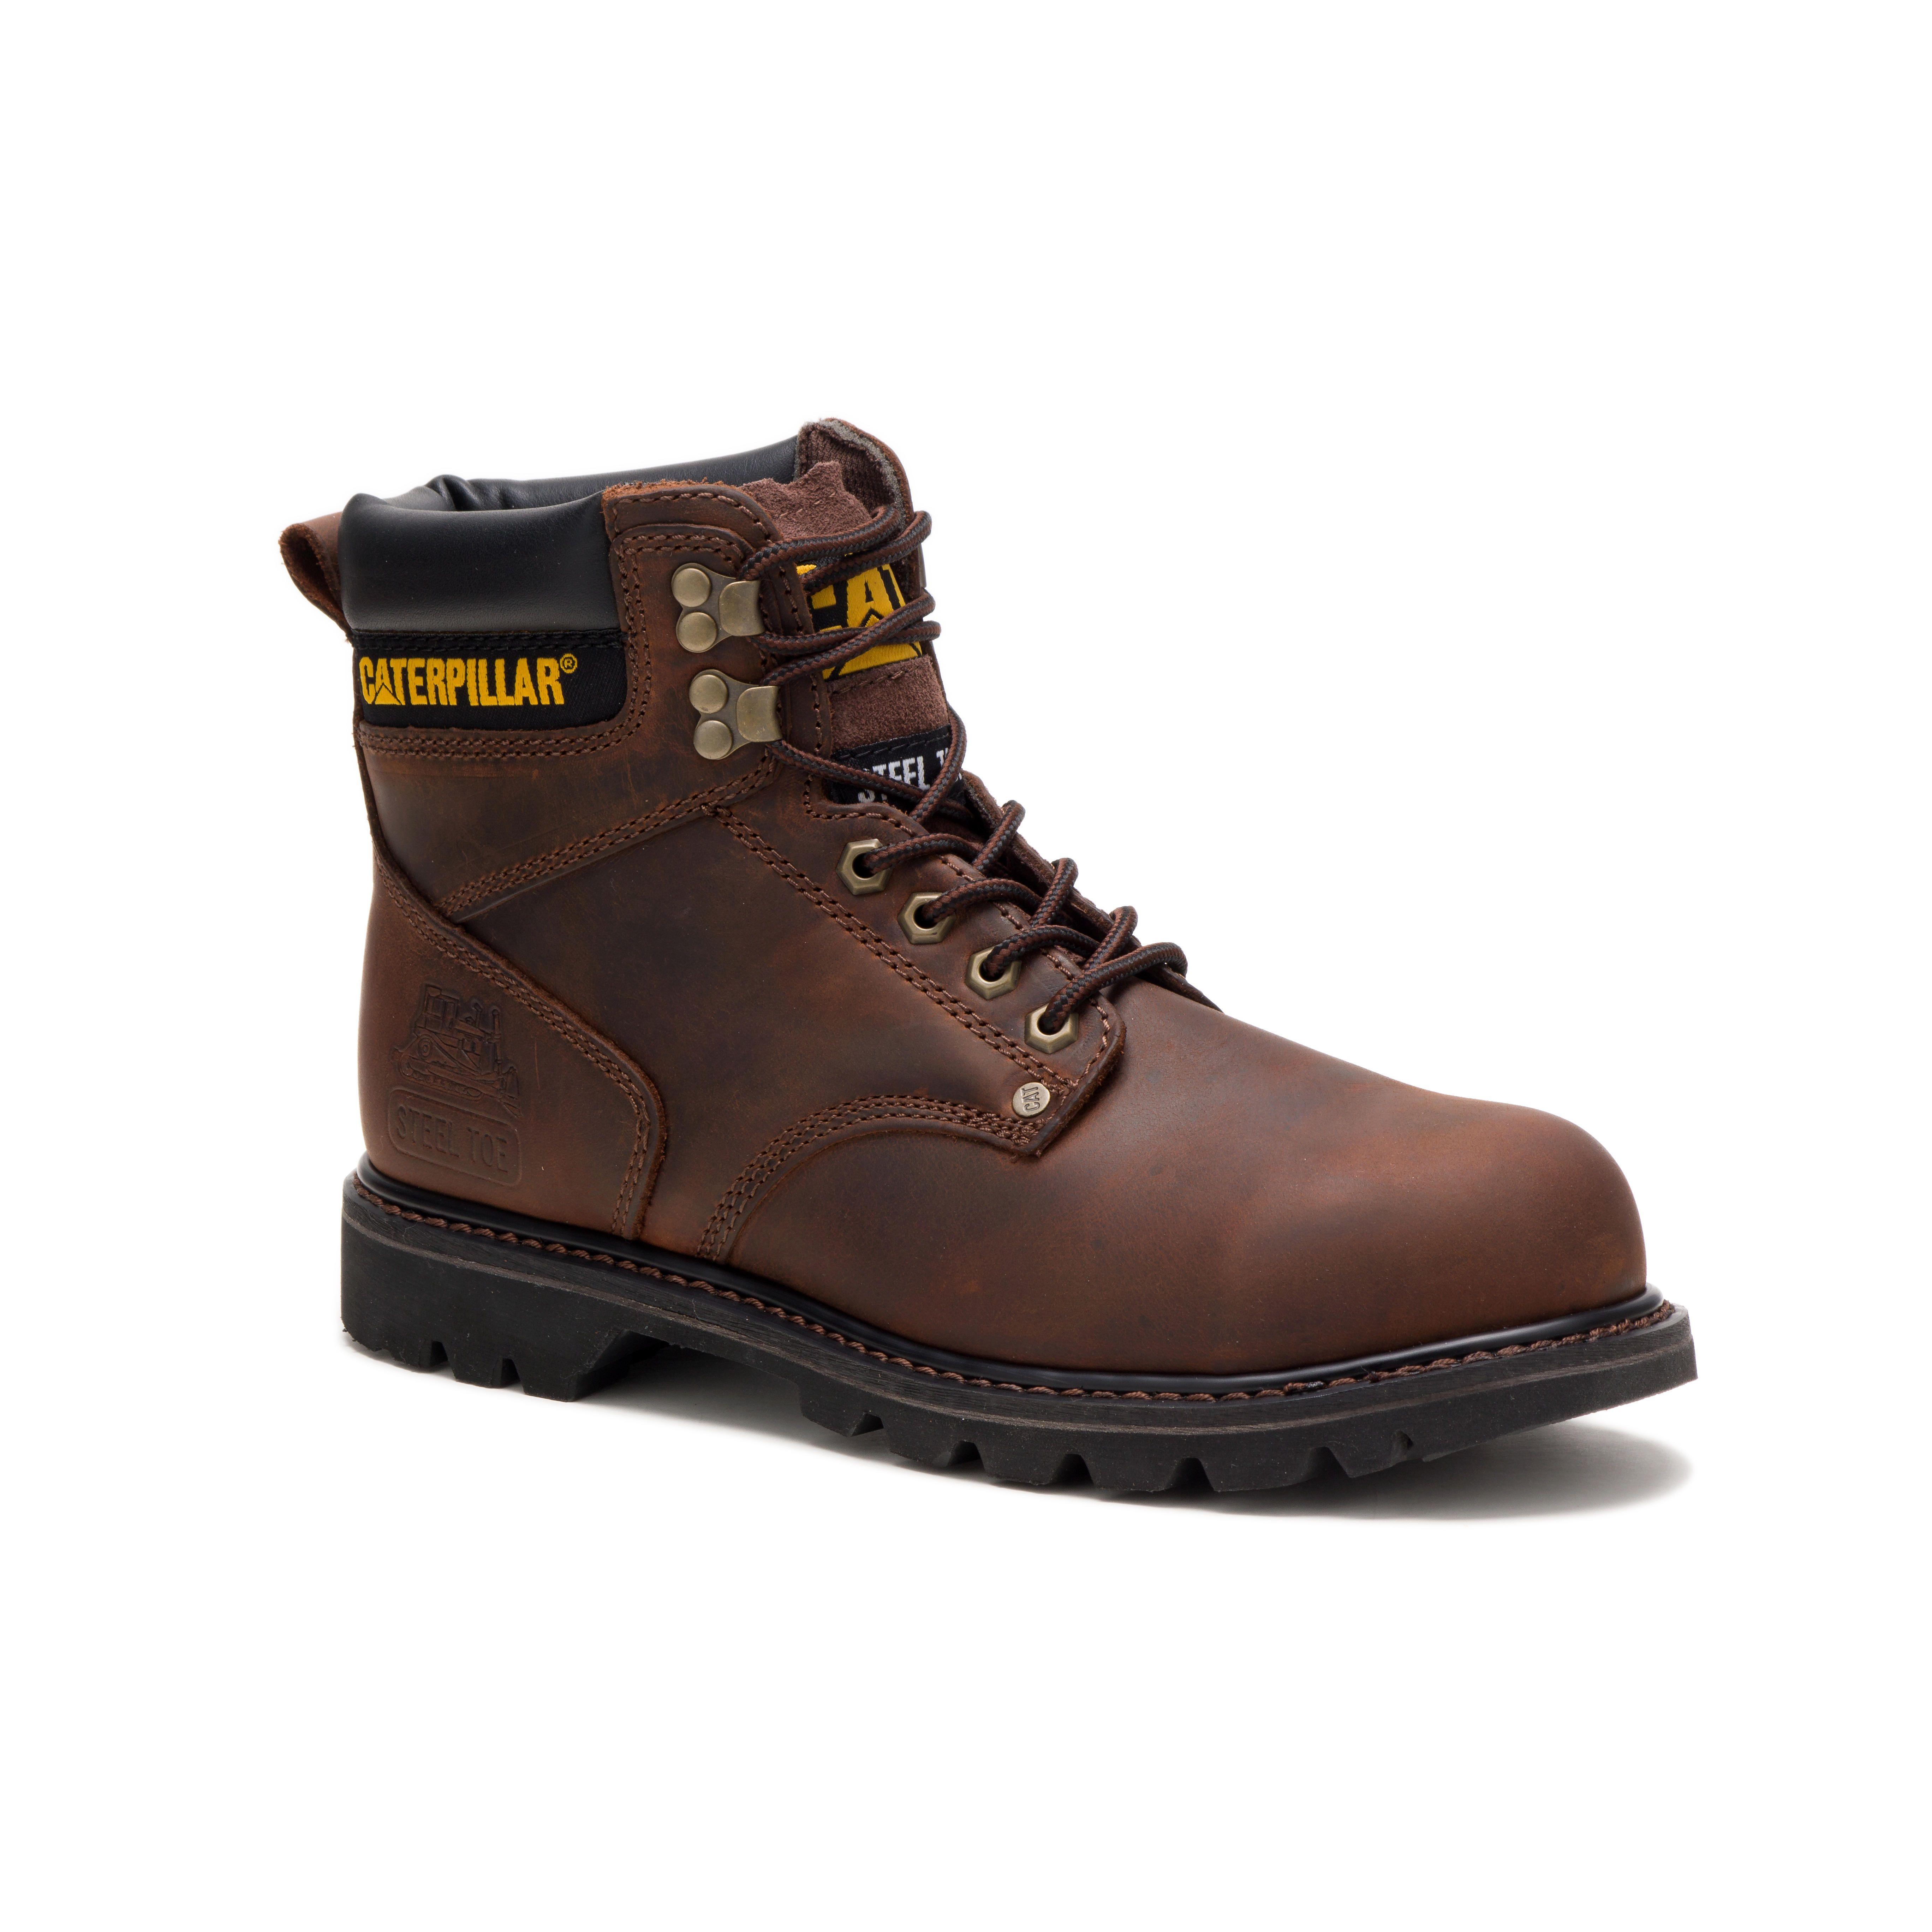 89ef6616c11 Second Shift Steel Toe Work Boot